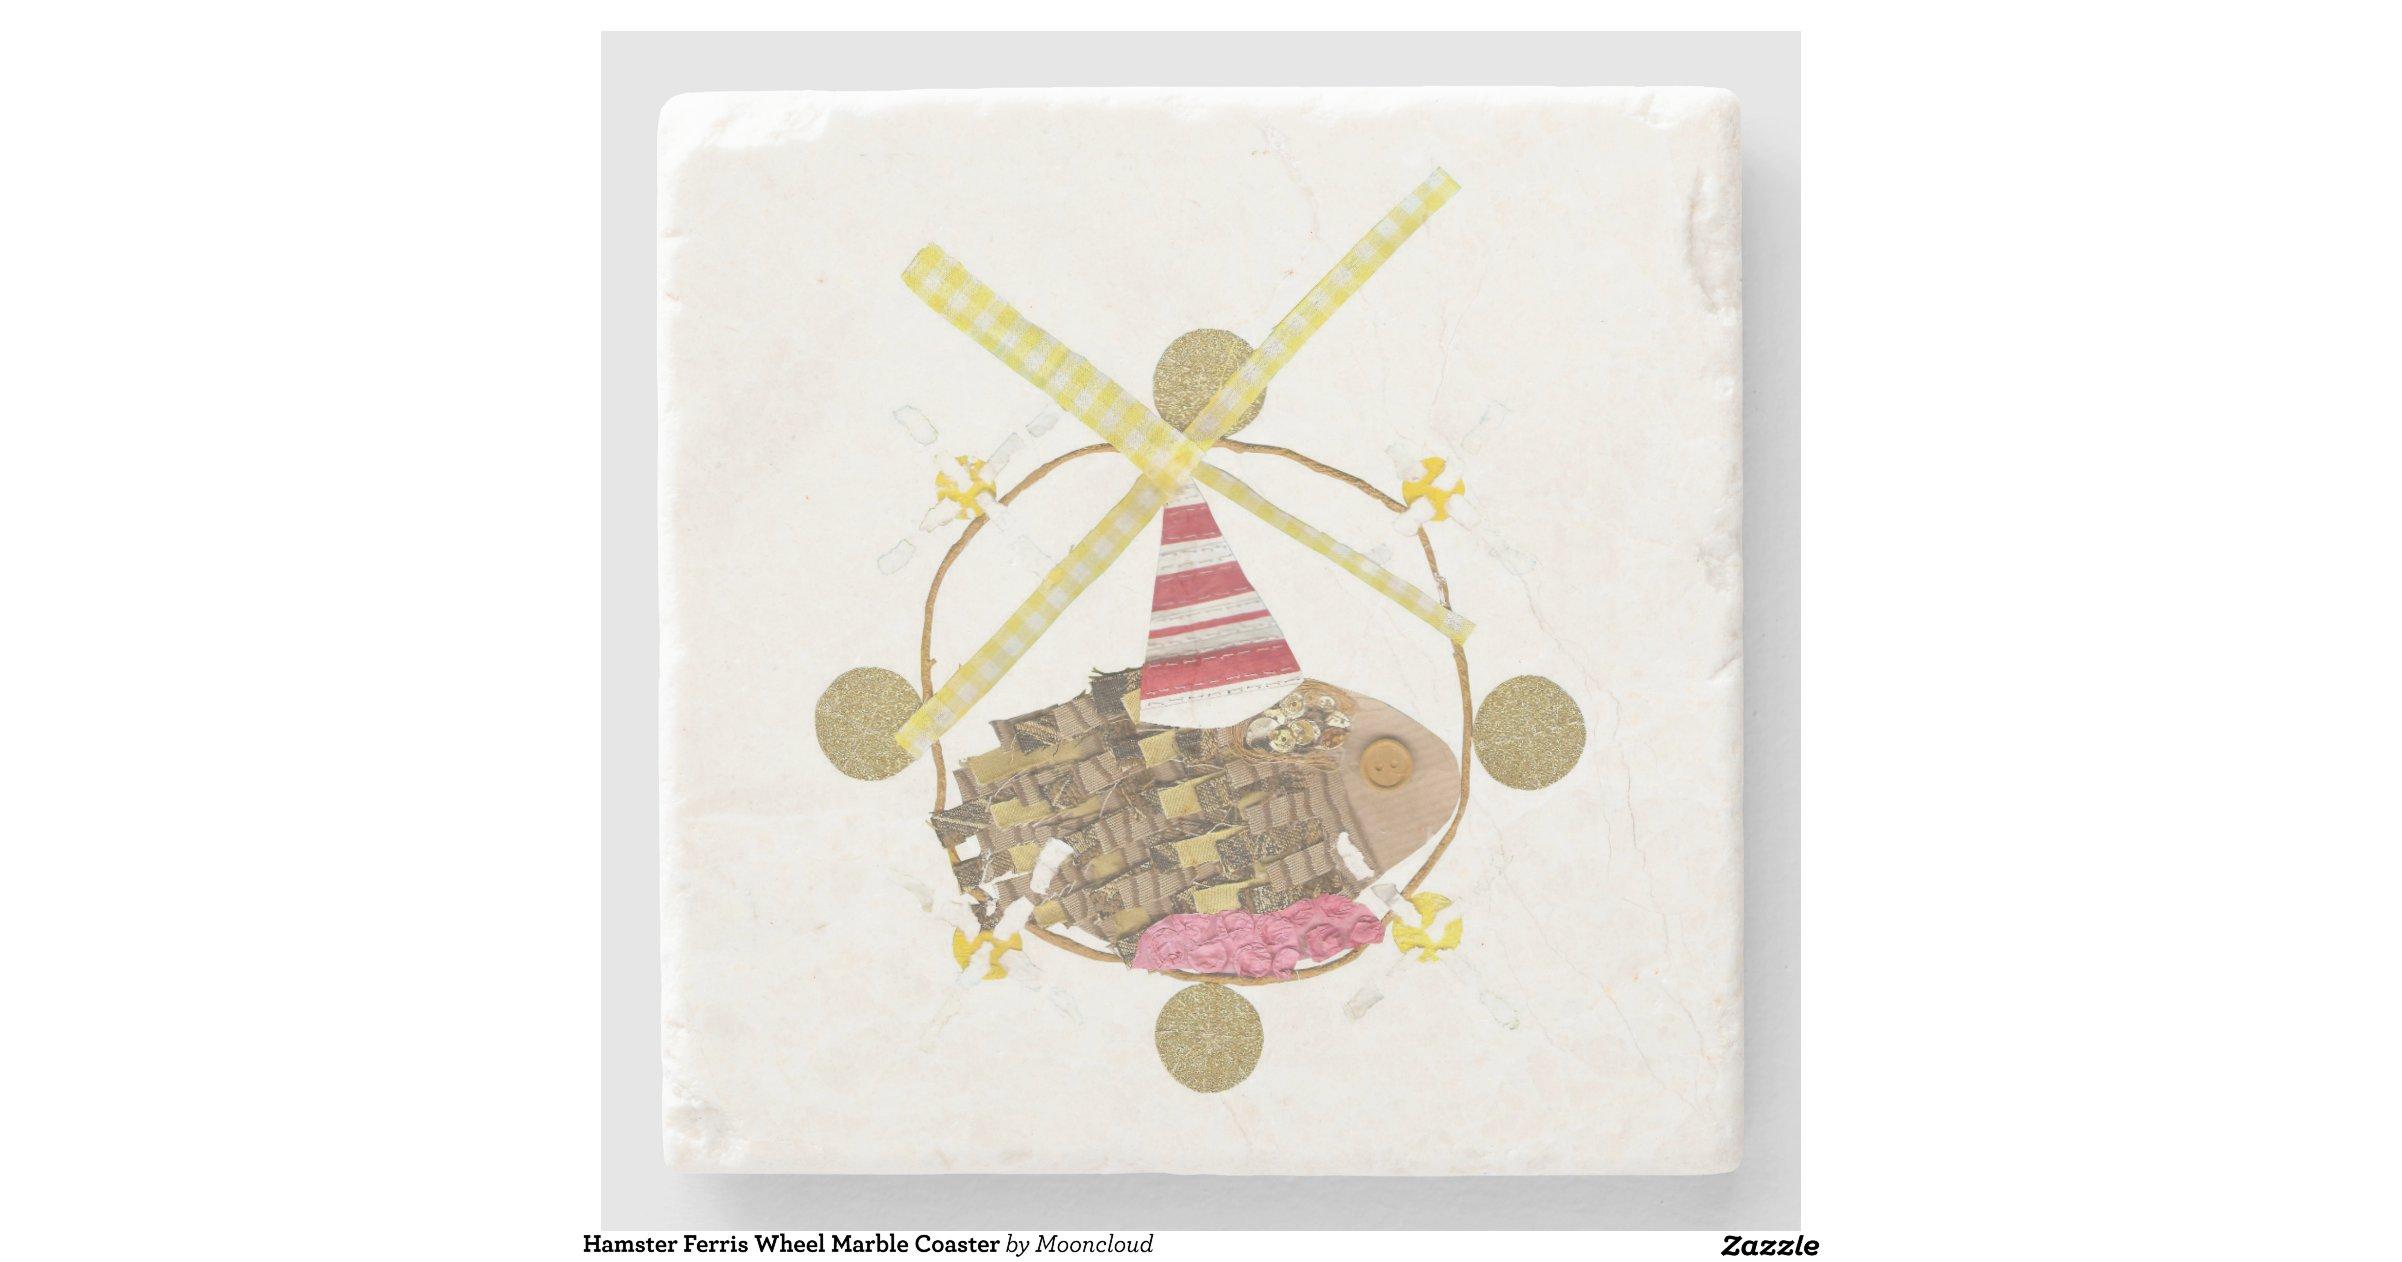 Marble Coster Wheels : Hamster ferris wheel marble coaster stone zazzle